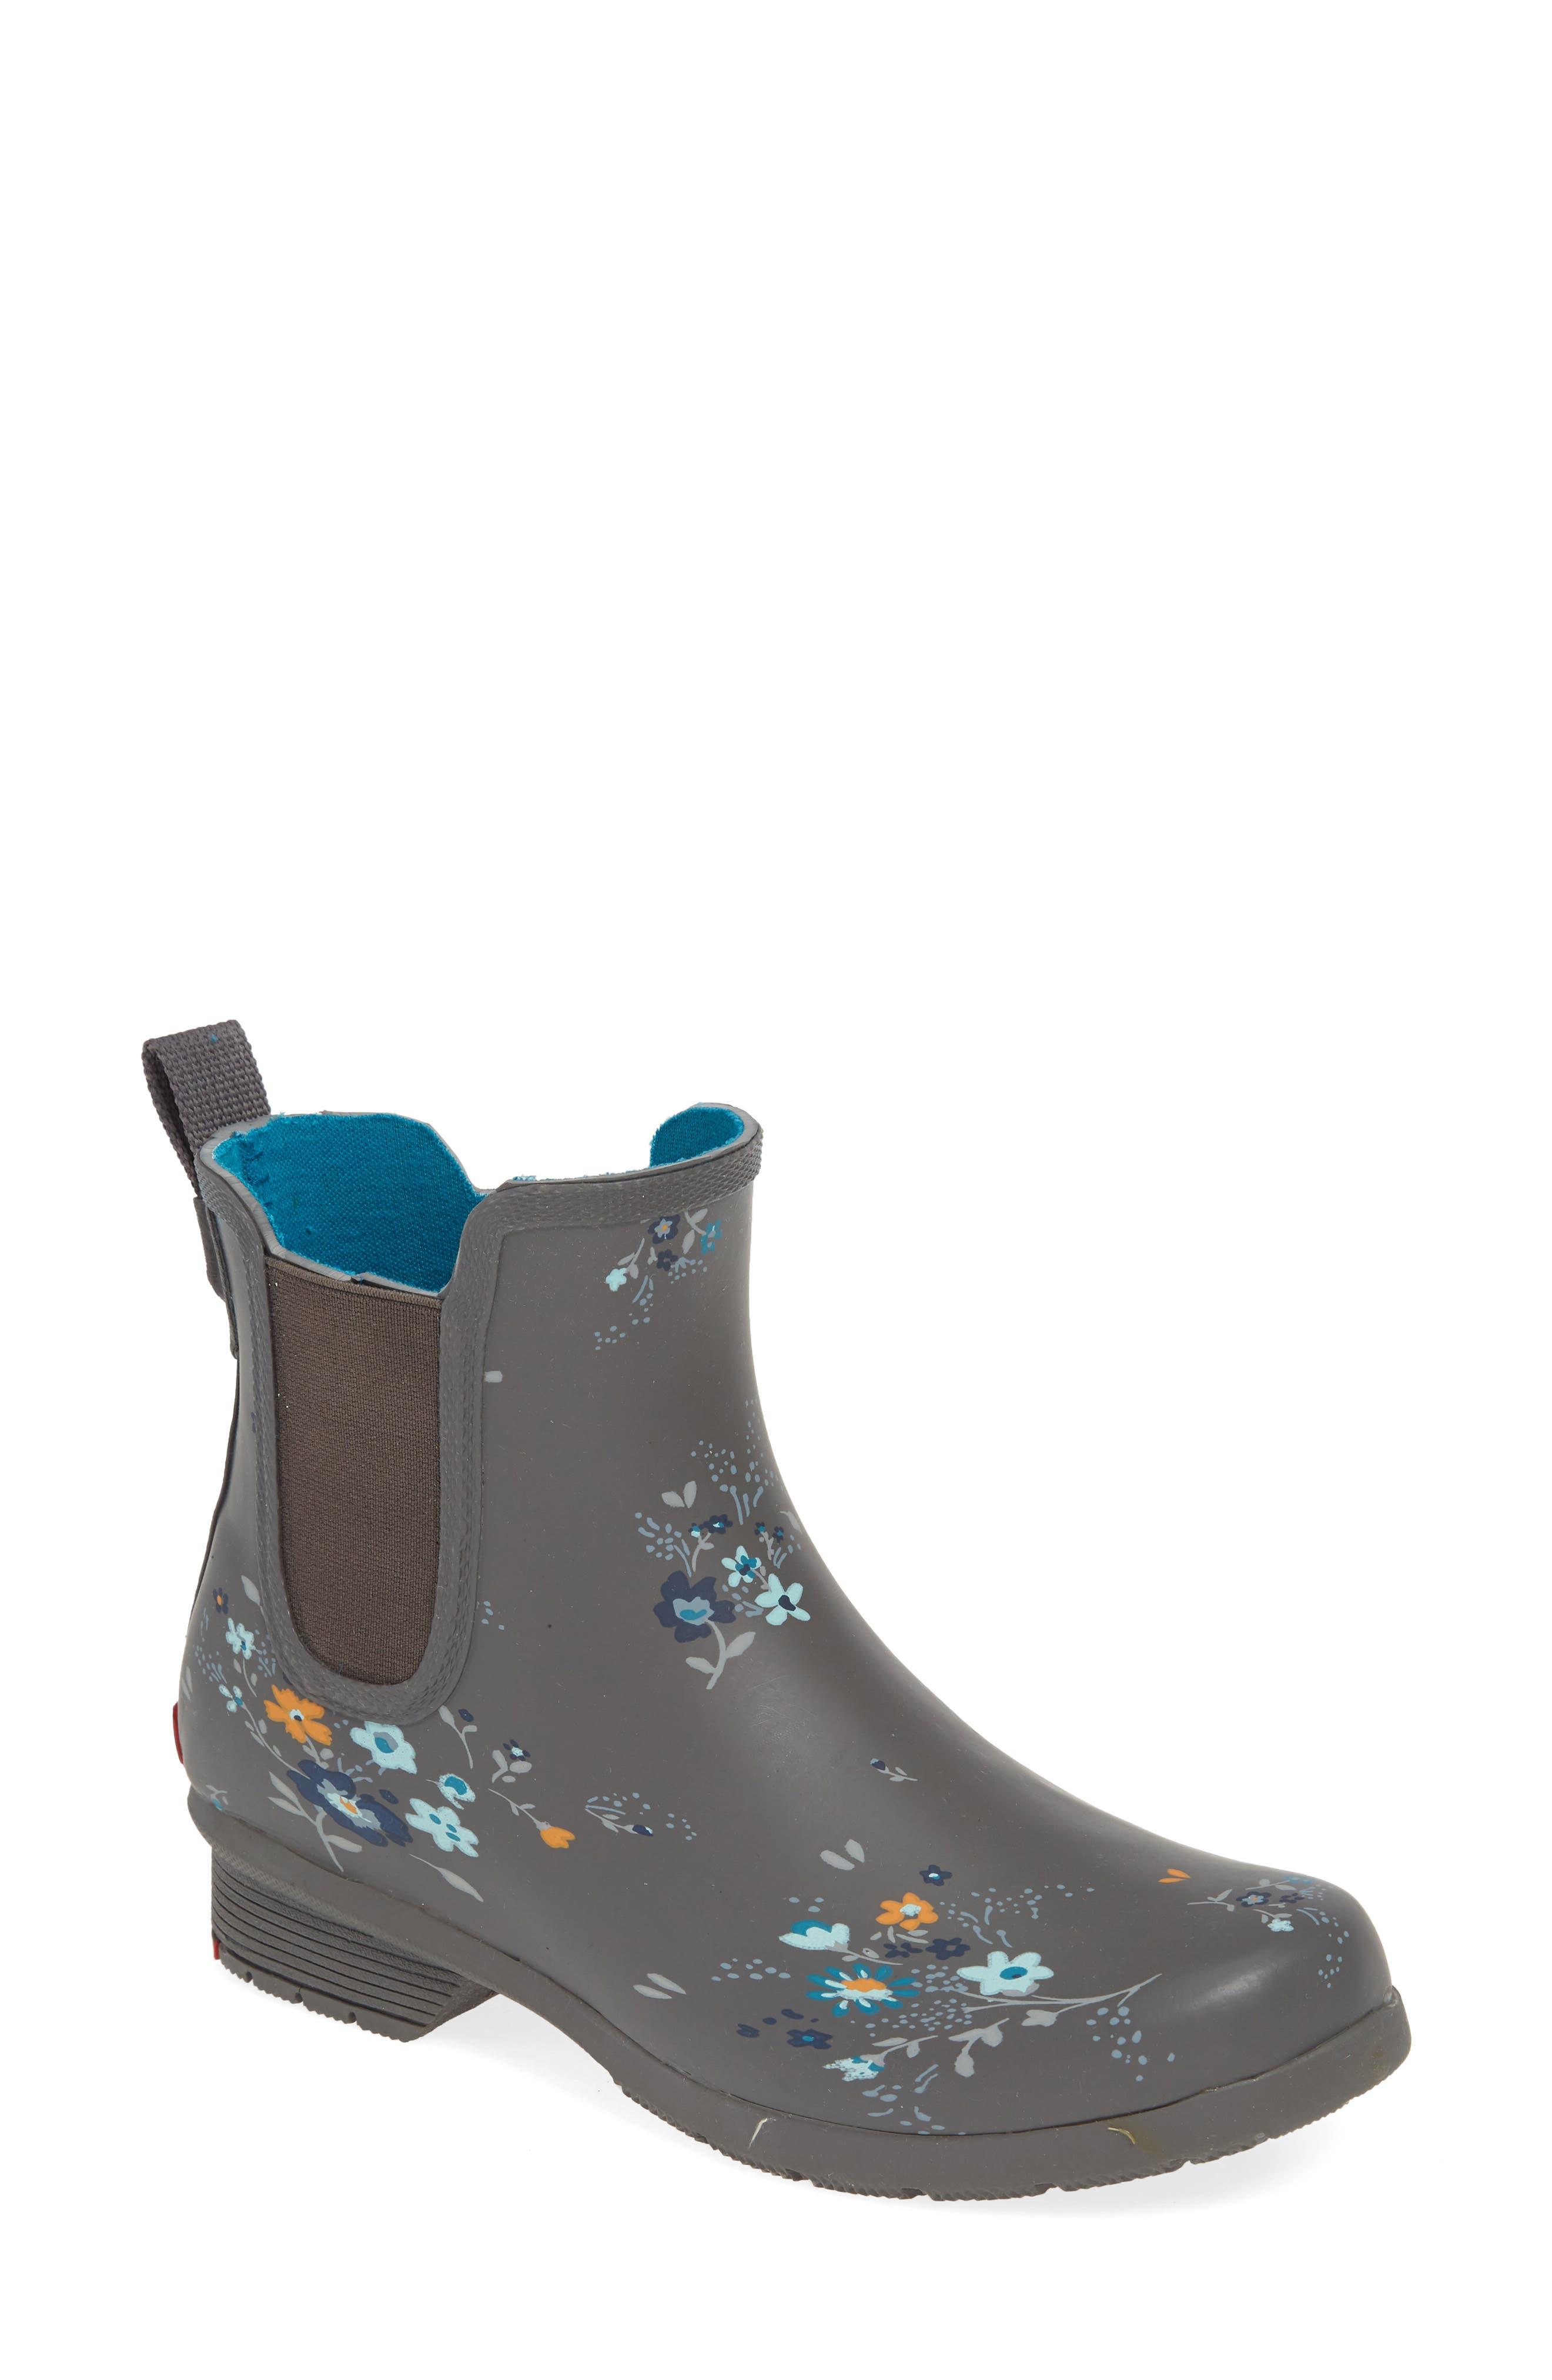 6561cb4a3ec85 Chooka Bainbridge Caroline Waterproof Chelsea Rain Boot